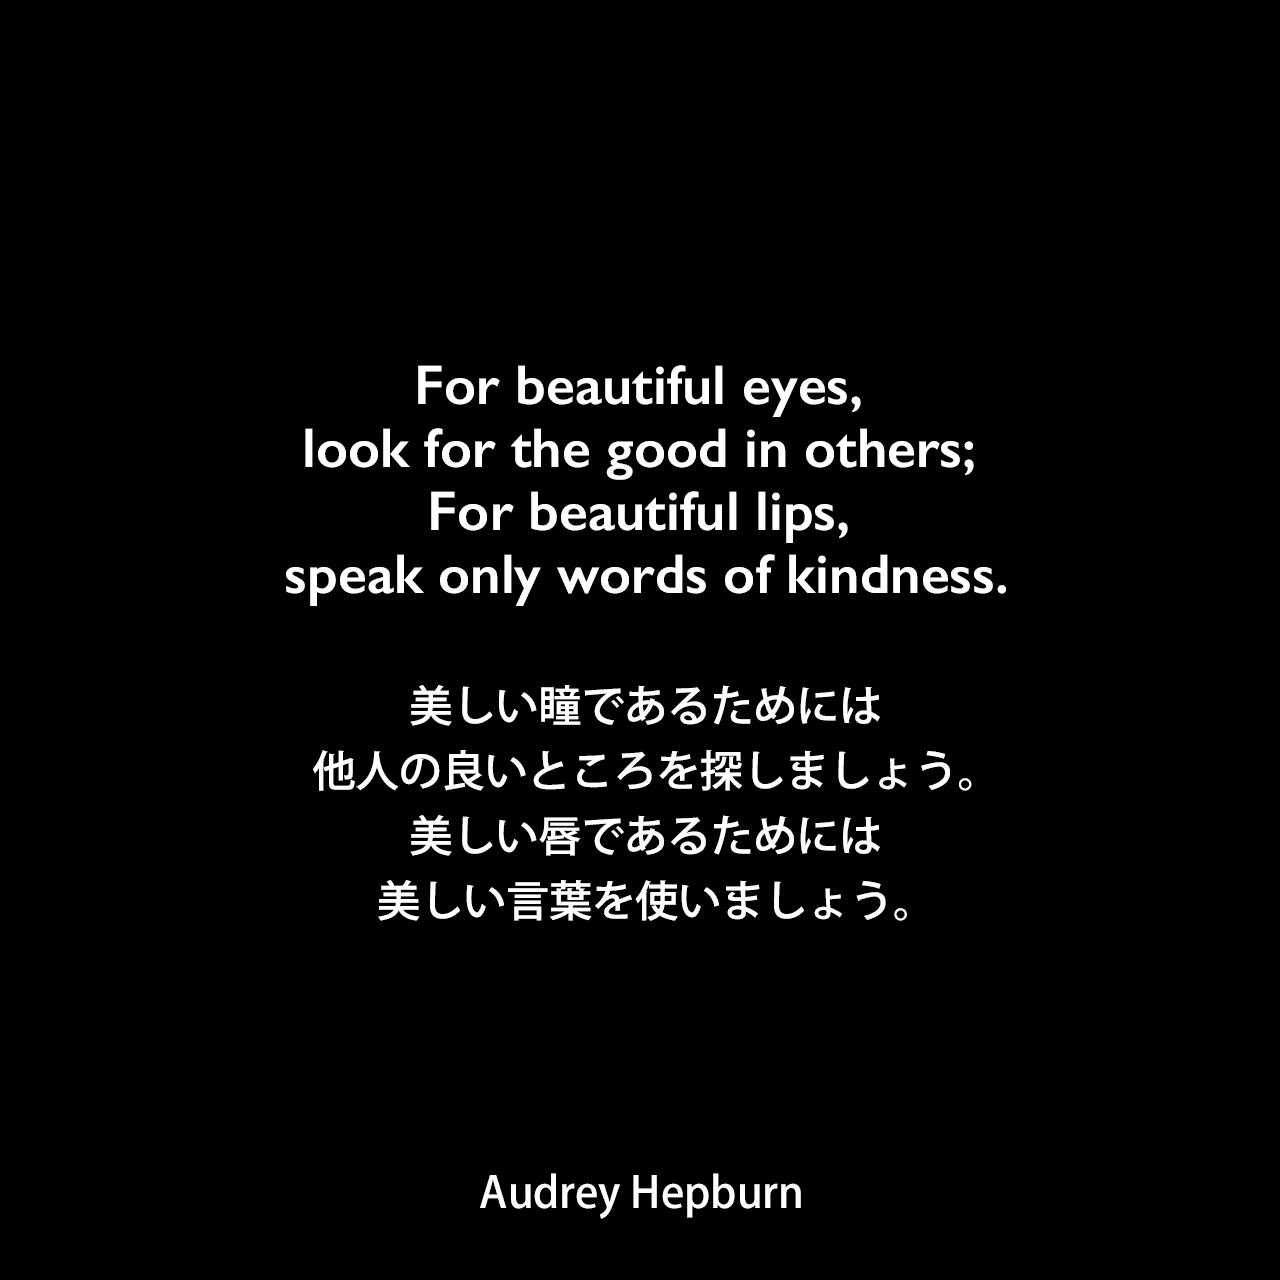 For beautiful eyes, look for the good in others; For beautiful lips, speak only words of kindness.美しい瞳であるためには、他人の良いところを探しましょう。美しい唇であるためには、美しい言葉を使いましょう。Audrey Hepburn